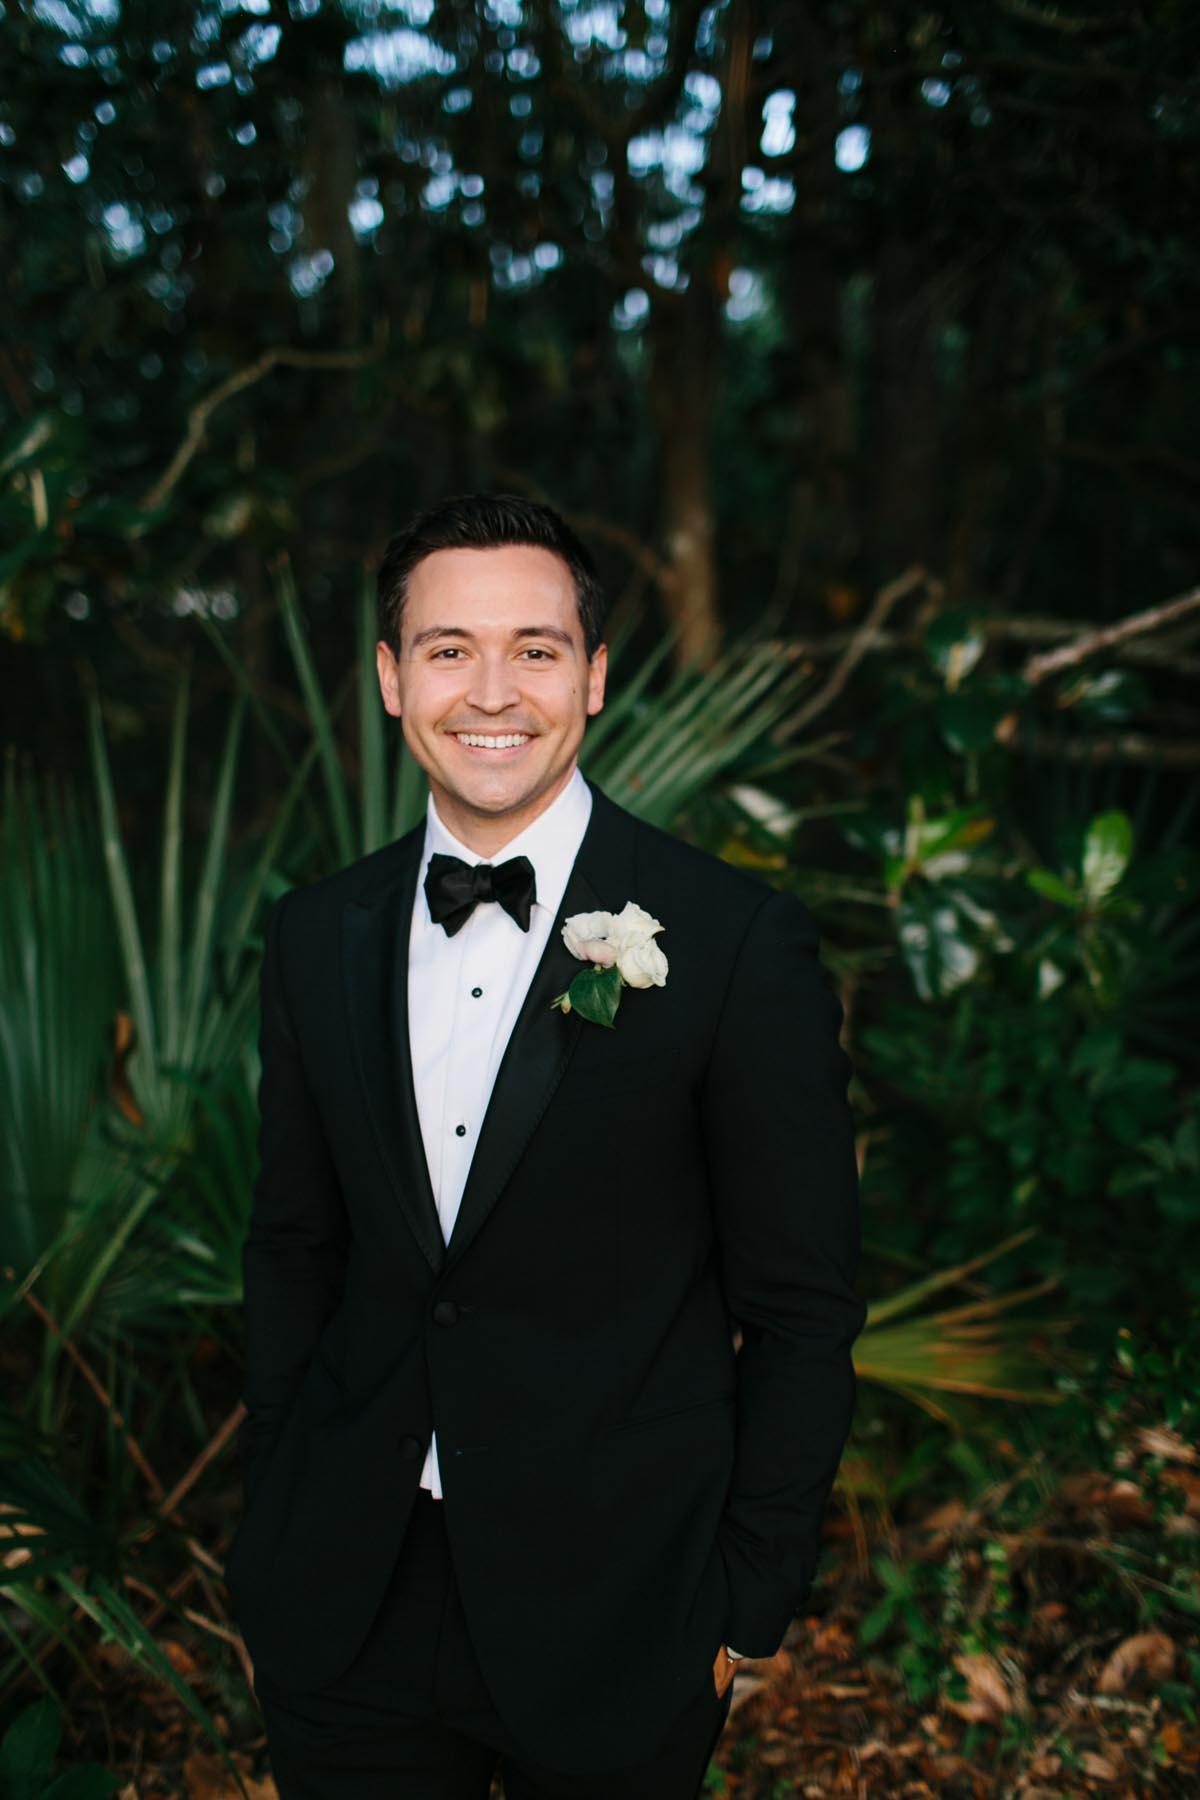 lowry wedding blog eden garden florida wedding-93